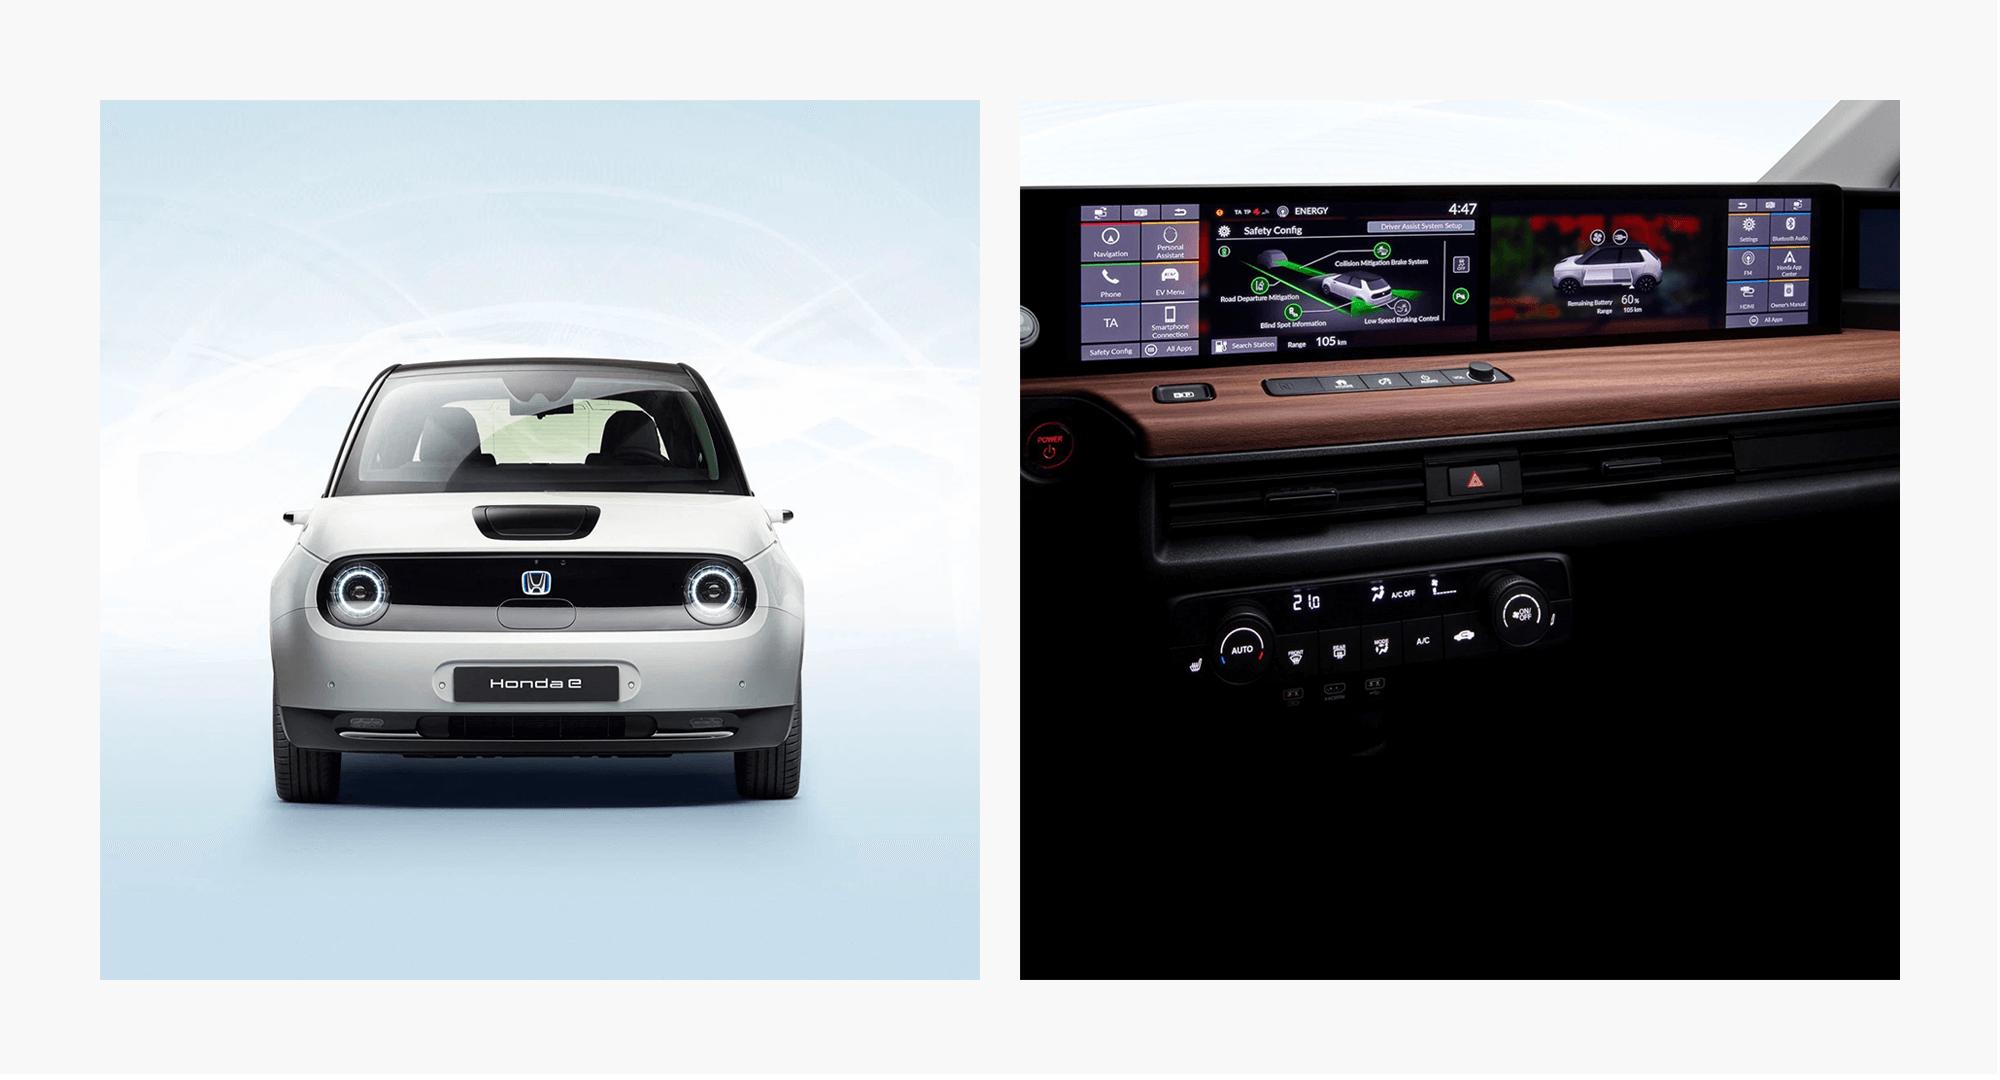 Honda's electric generation, Honda e. The interior contains a futuristic, mega-wide digital dashboard.